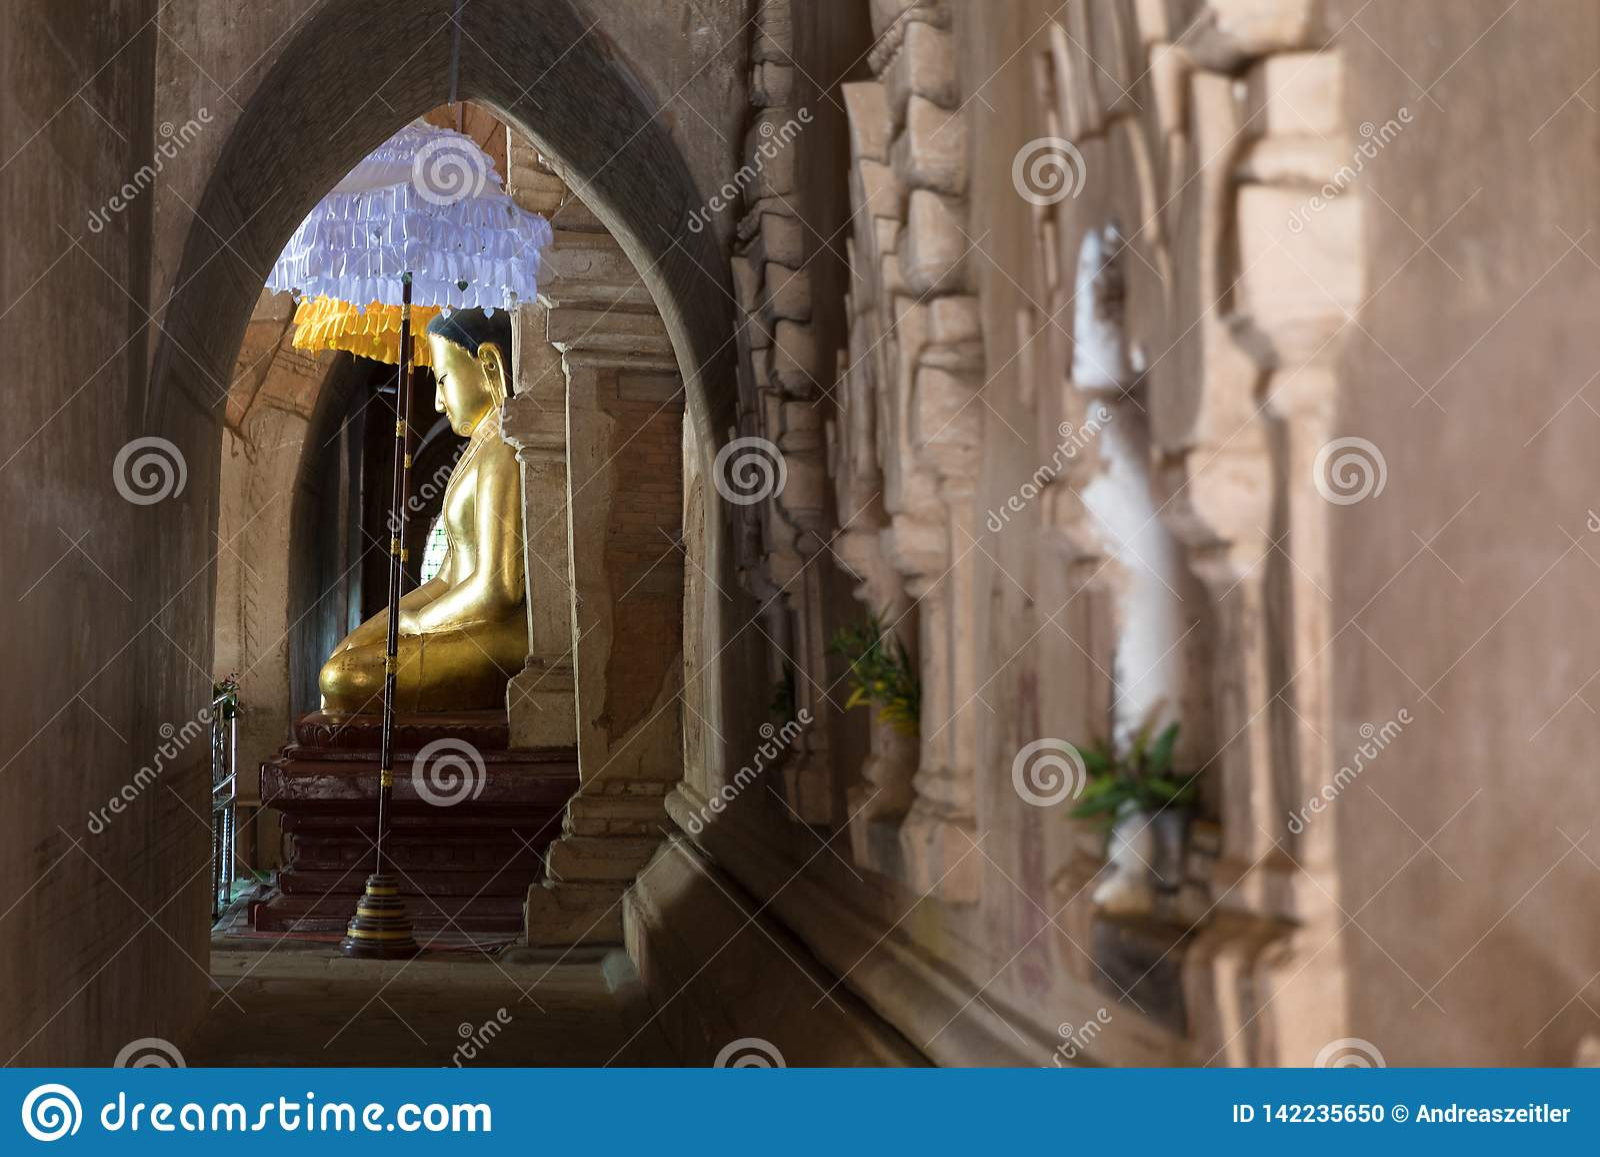 Statua di Buddha in un tempio antico in Bagan, Myanmar (Birmania